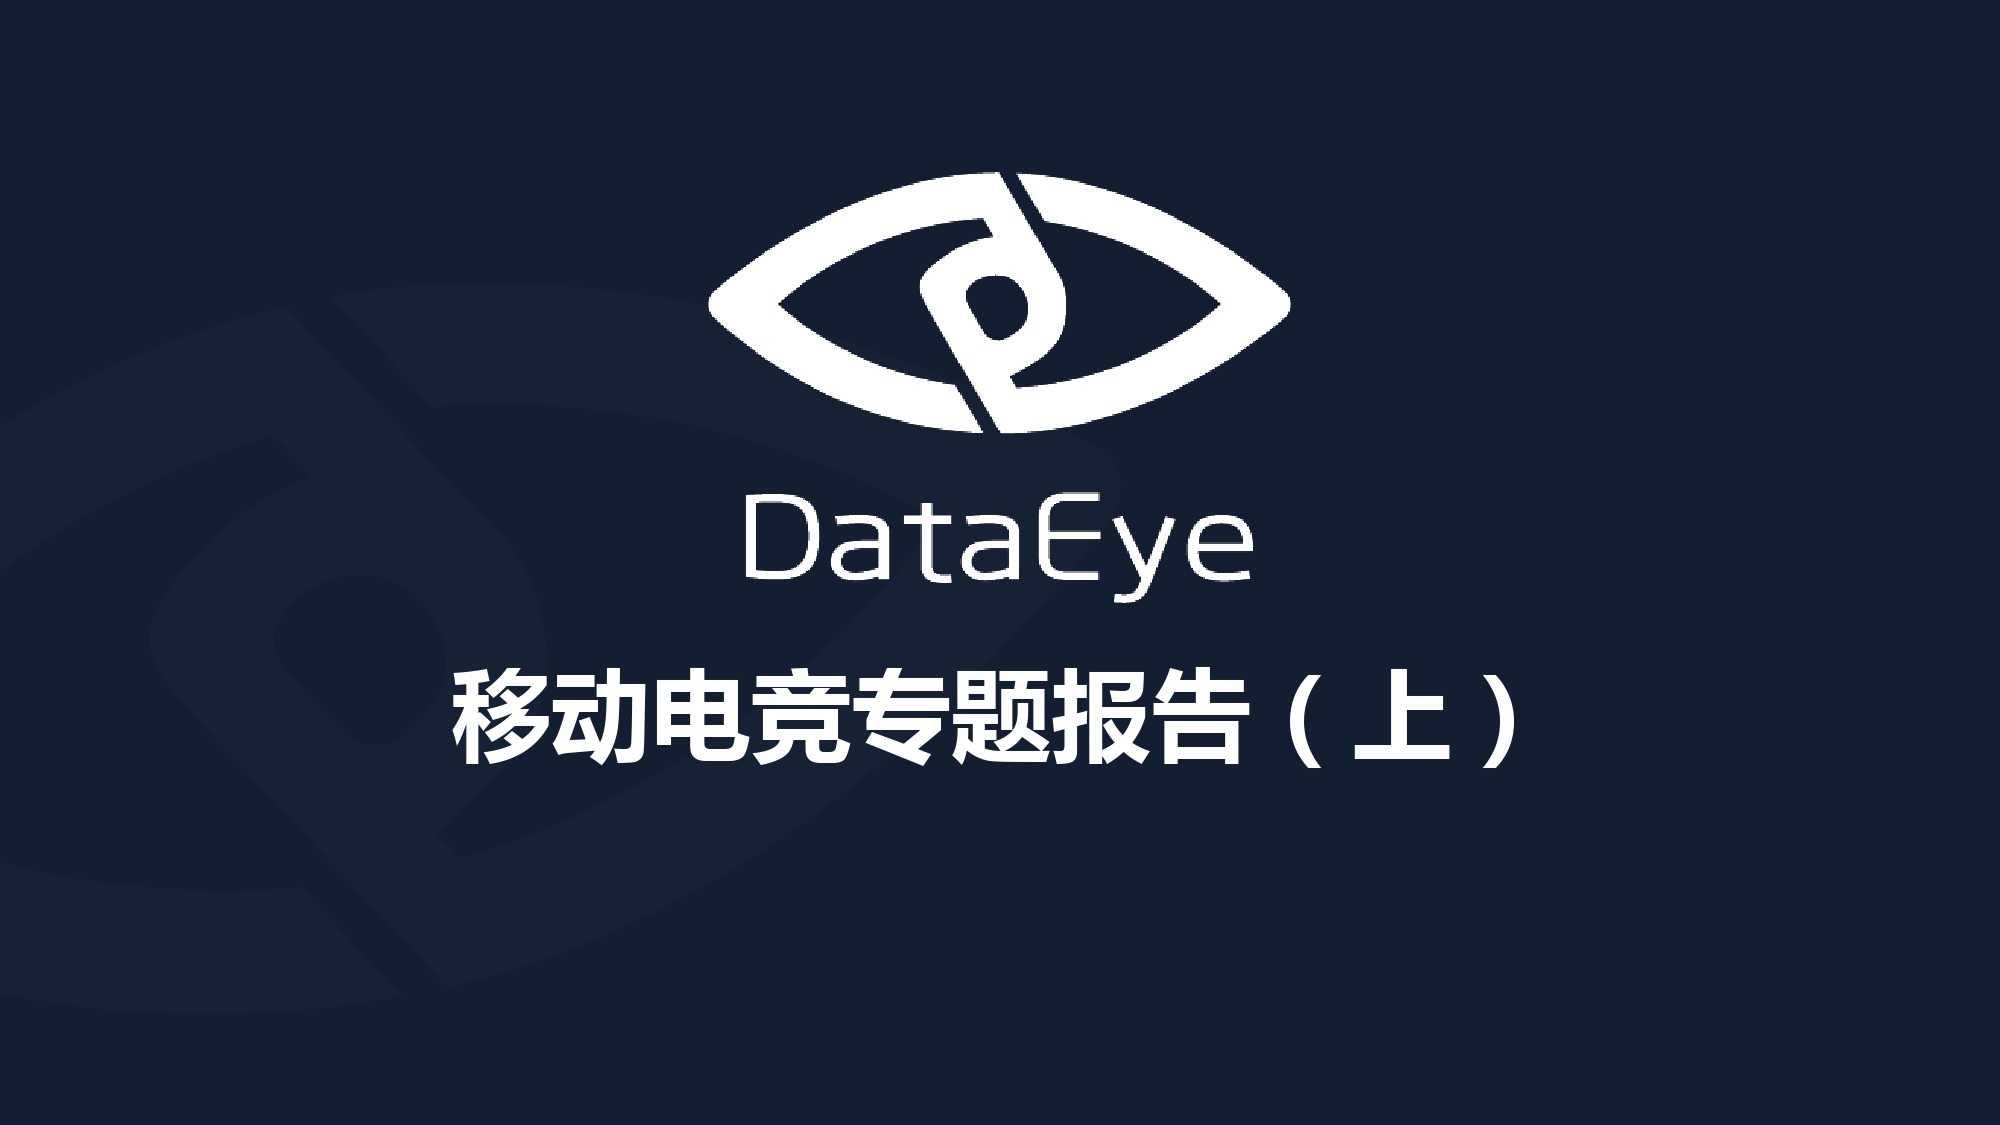 Dataeys:移动电竞专题报告(上)_000001